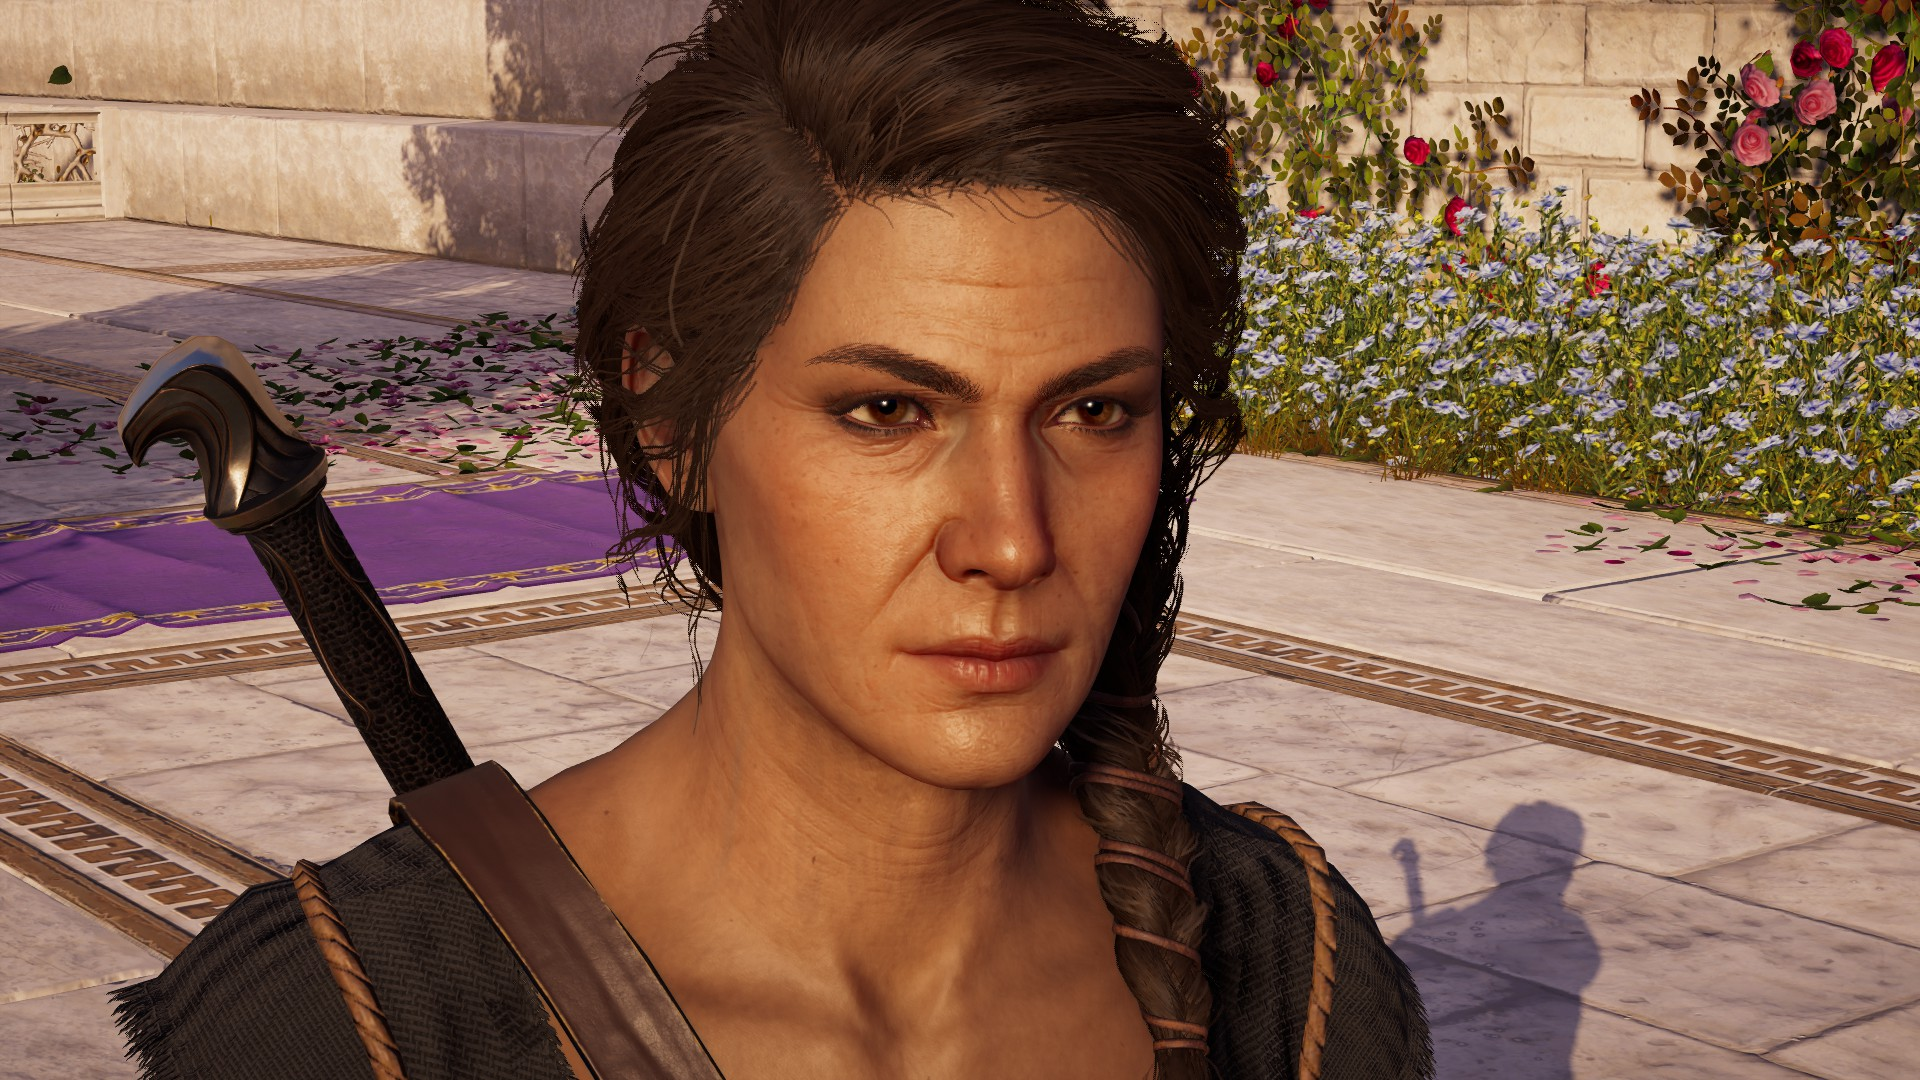 Kassandra at Assassins Creed Odyssey Nexus - Mods and